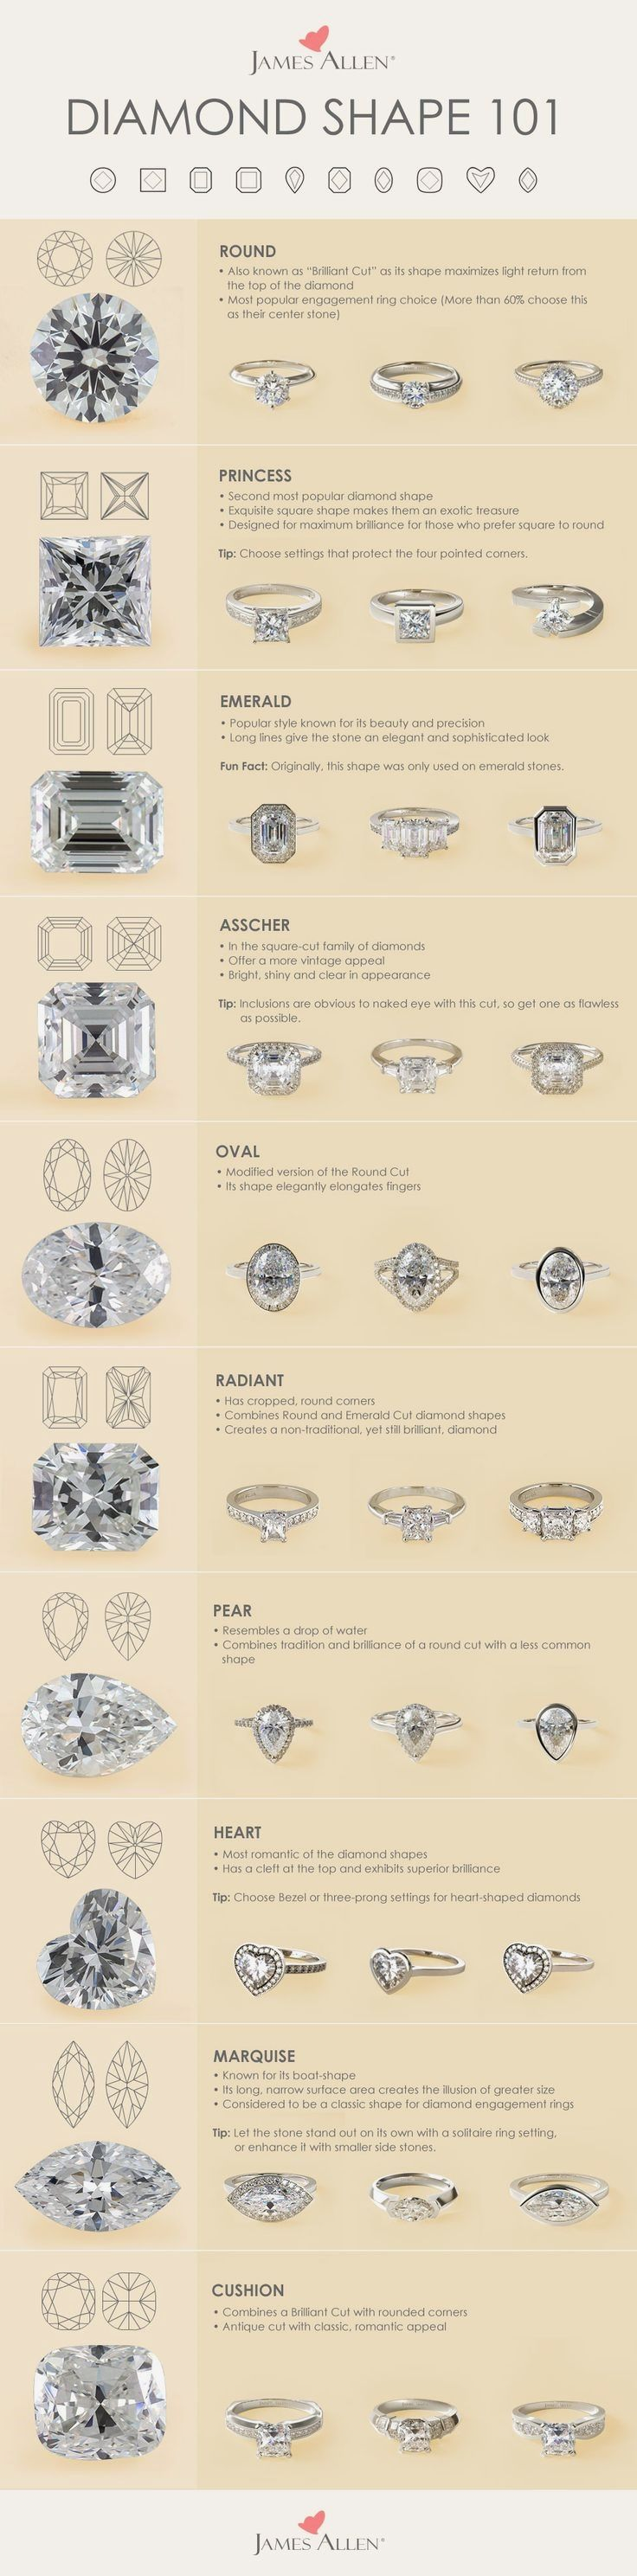 10 best diamonds images on Pinterest